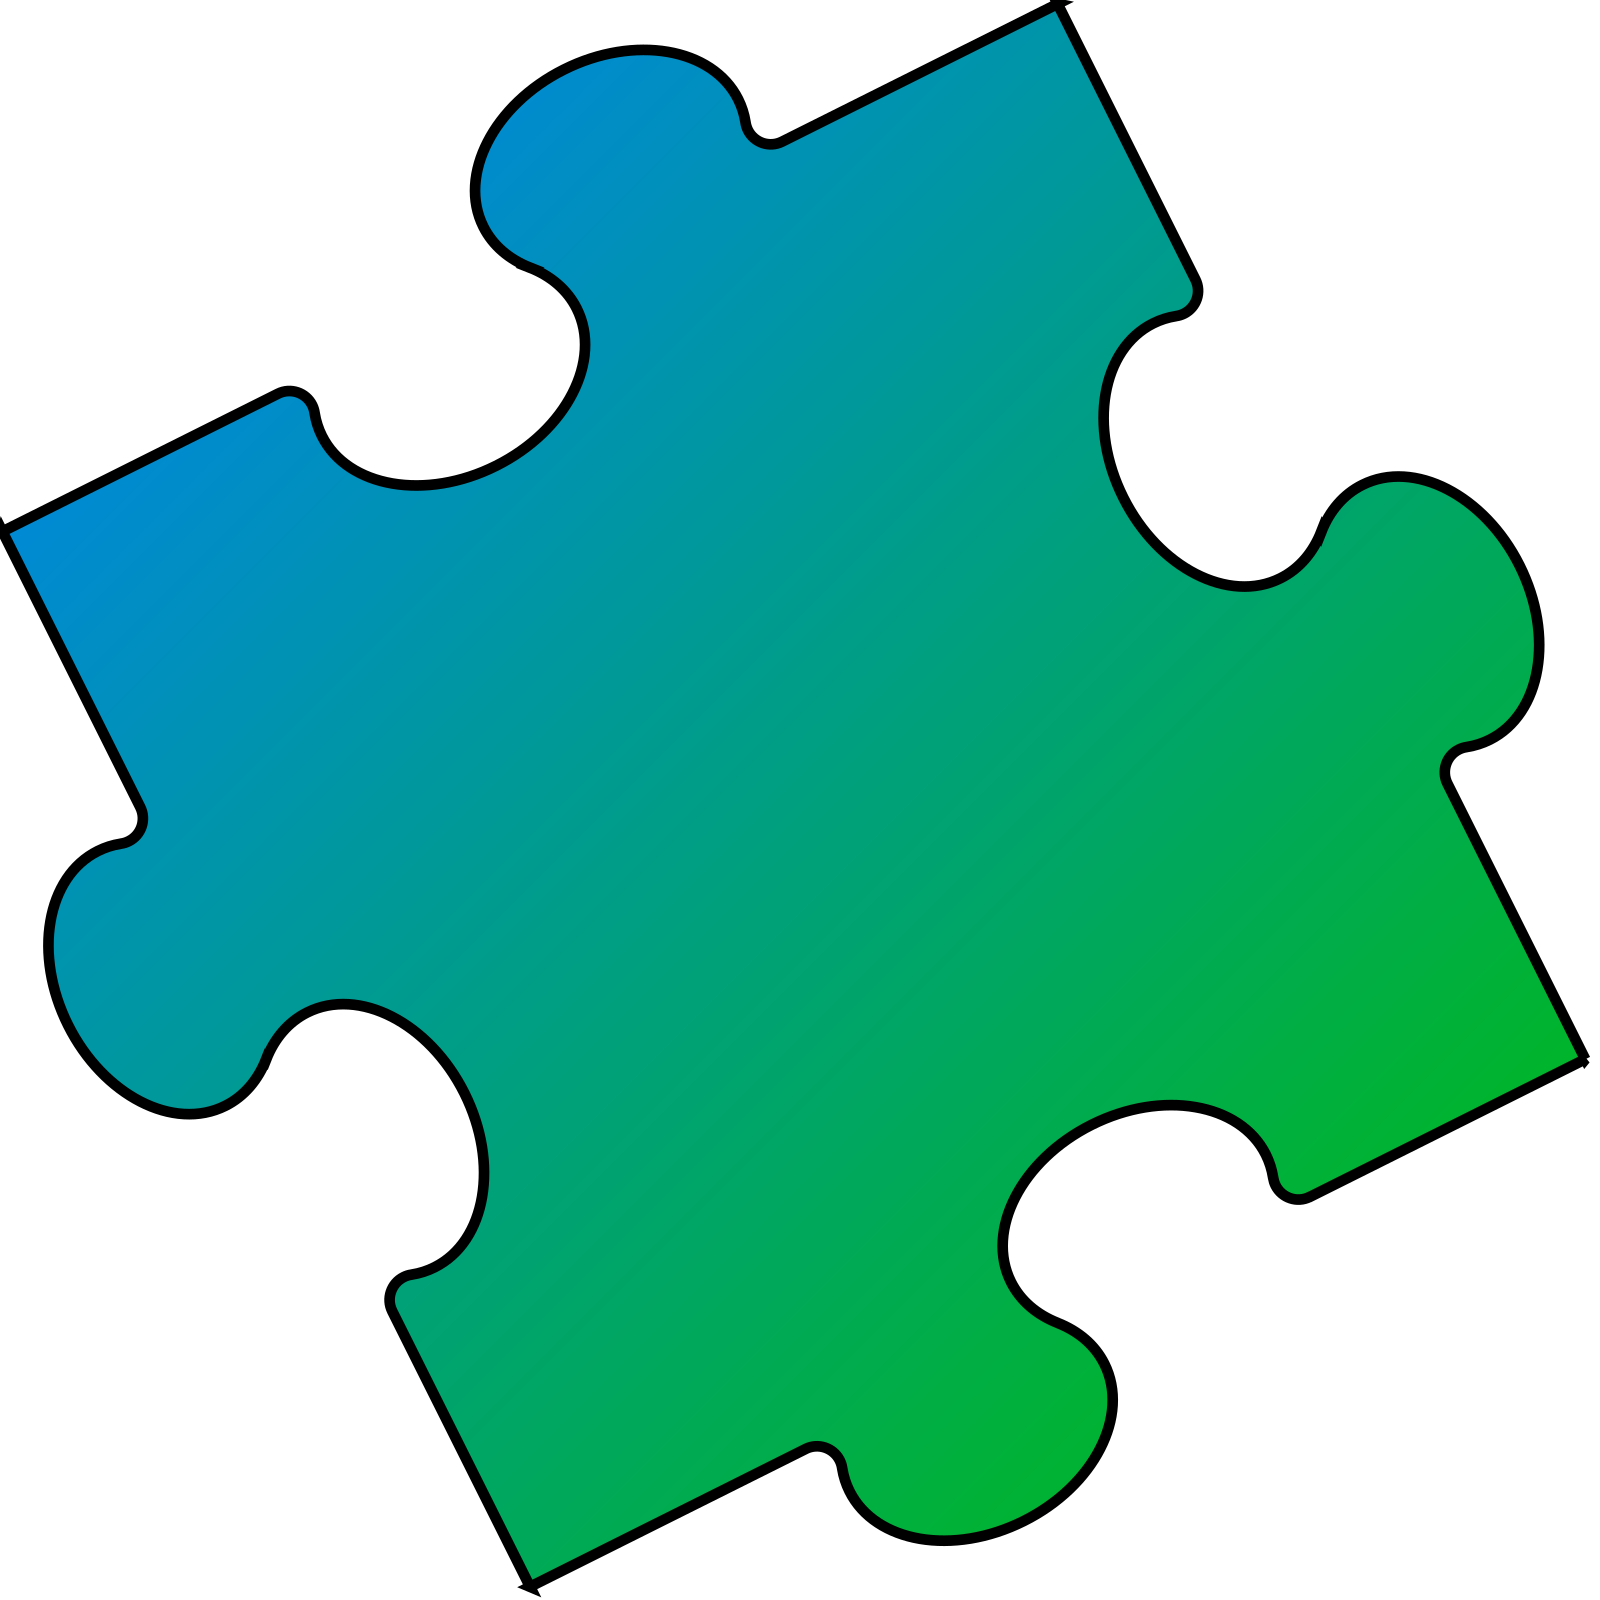 Puzzle piece small. Blue green clip art